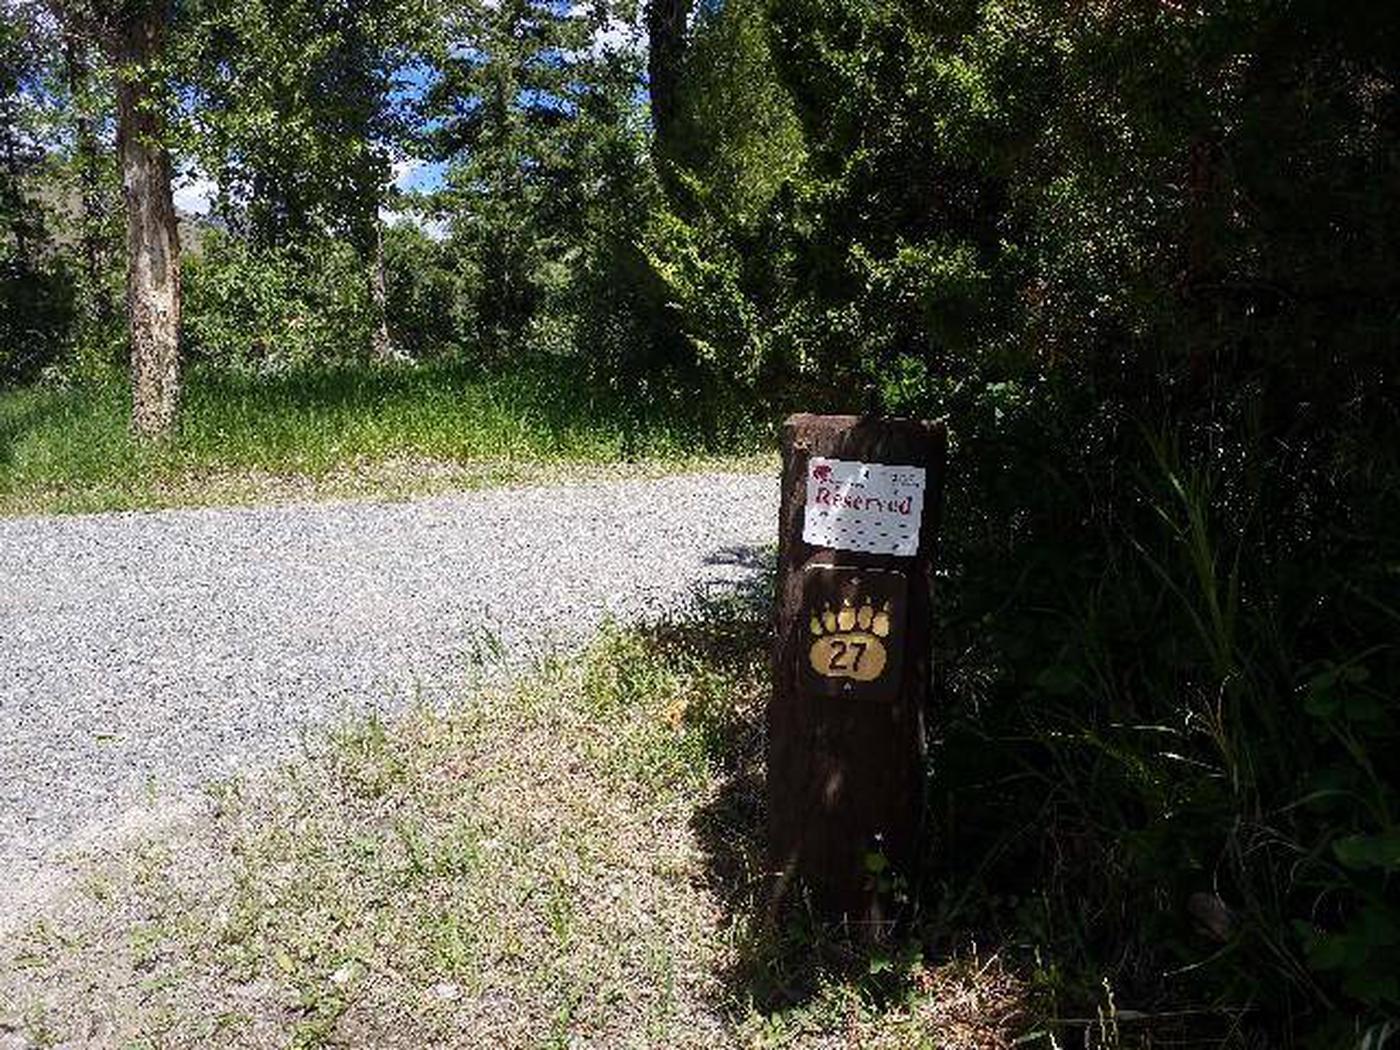 Wapiti Campsite 27 - Post